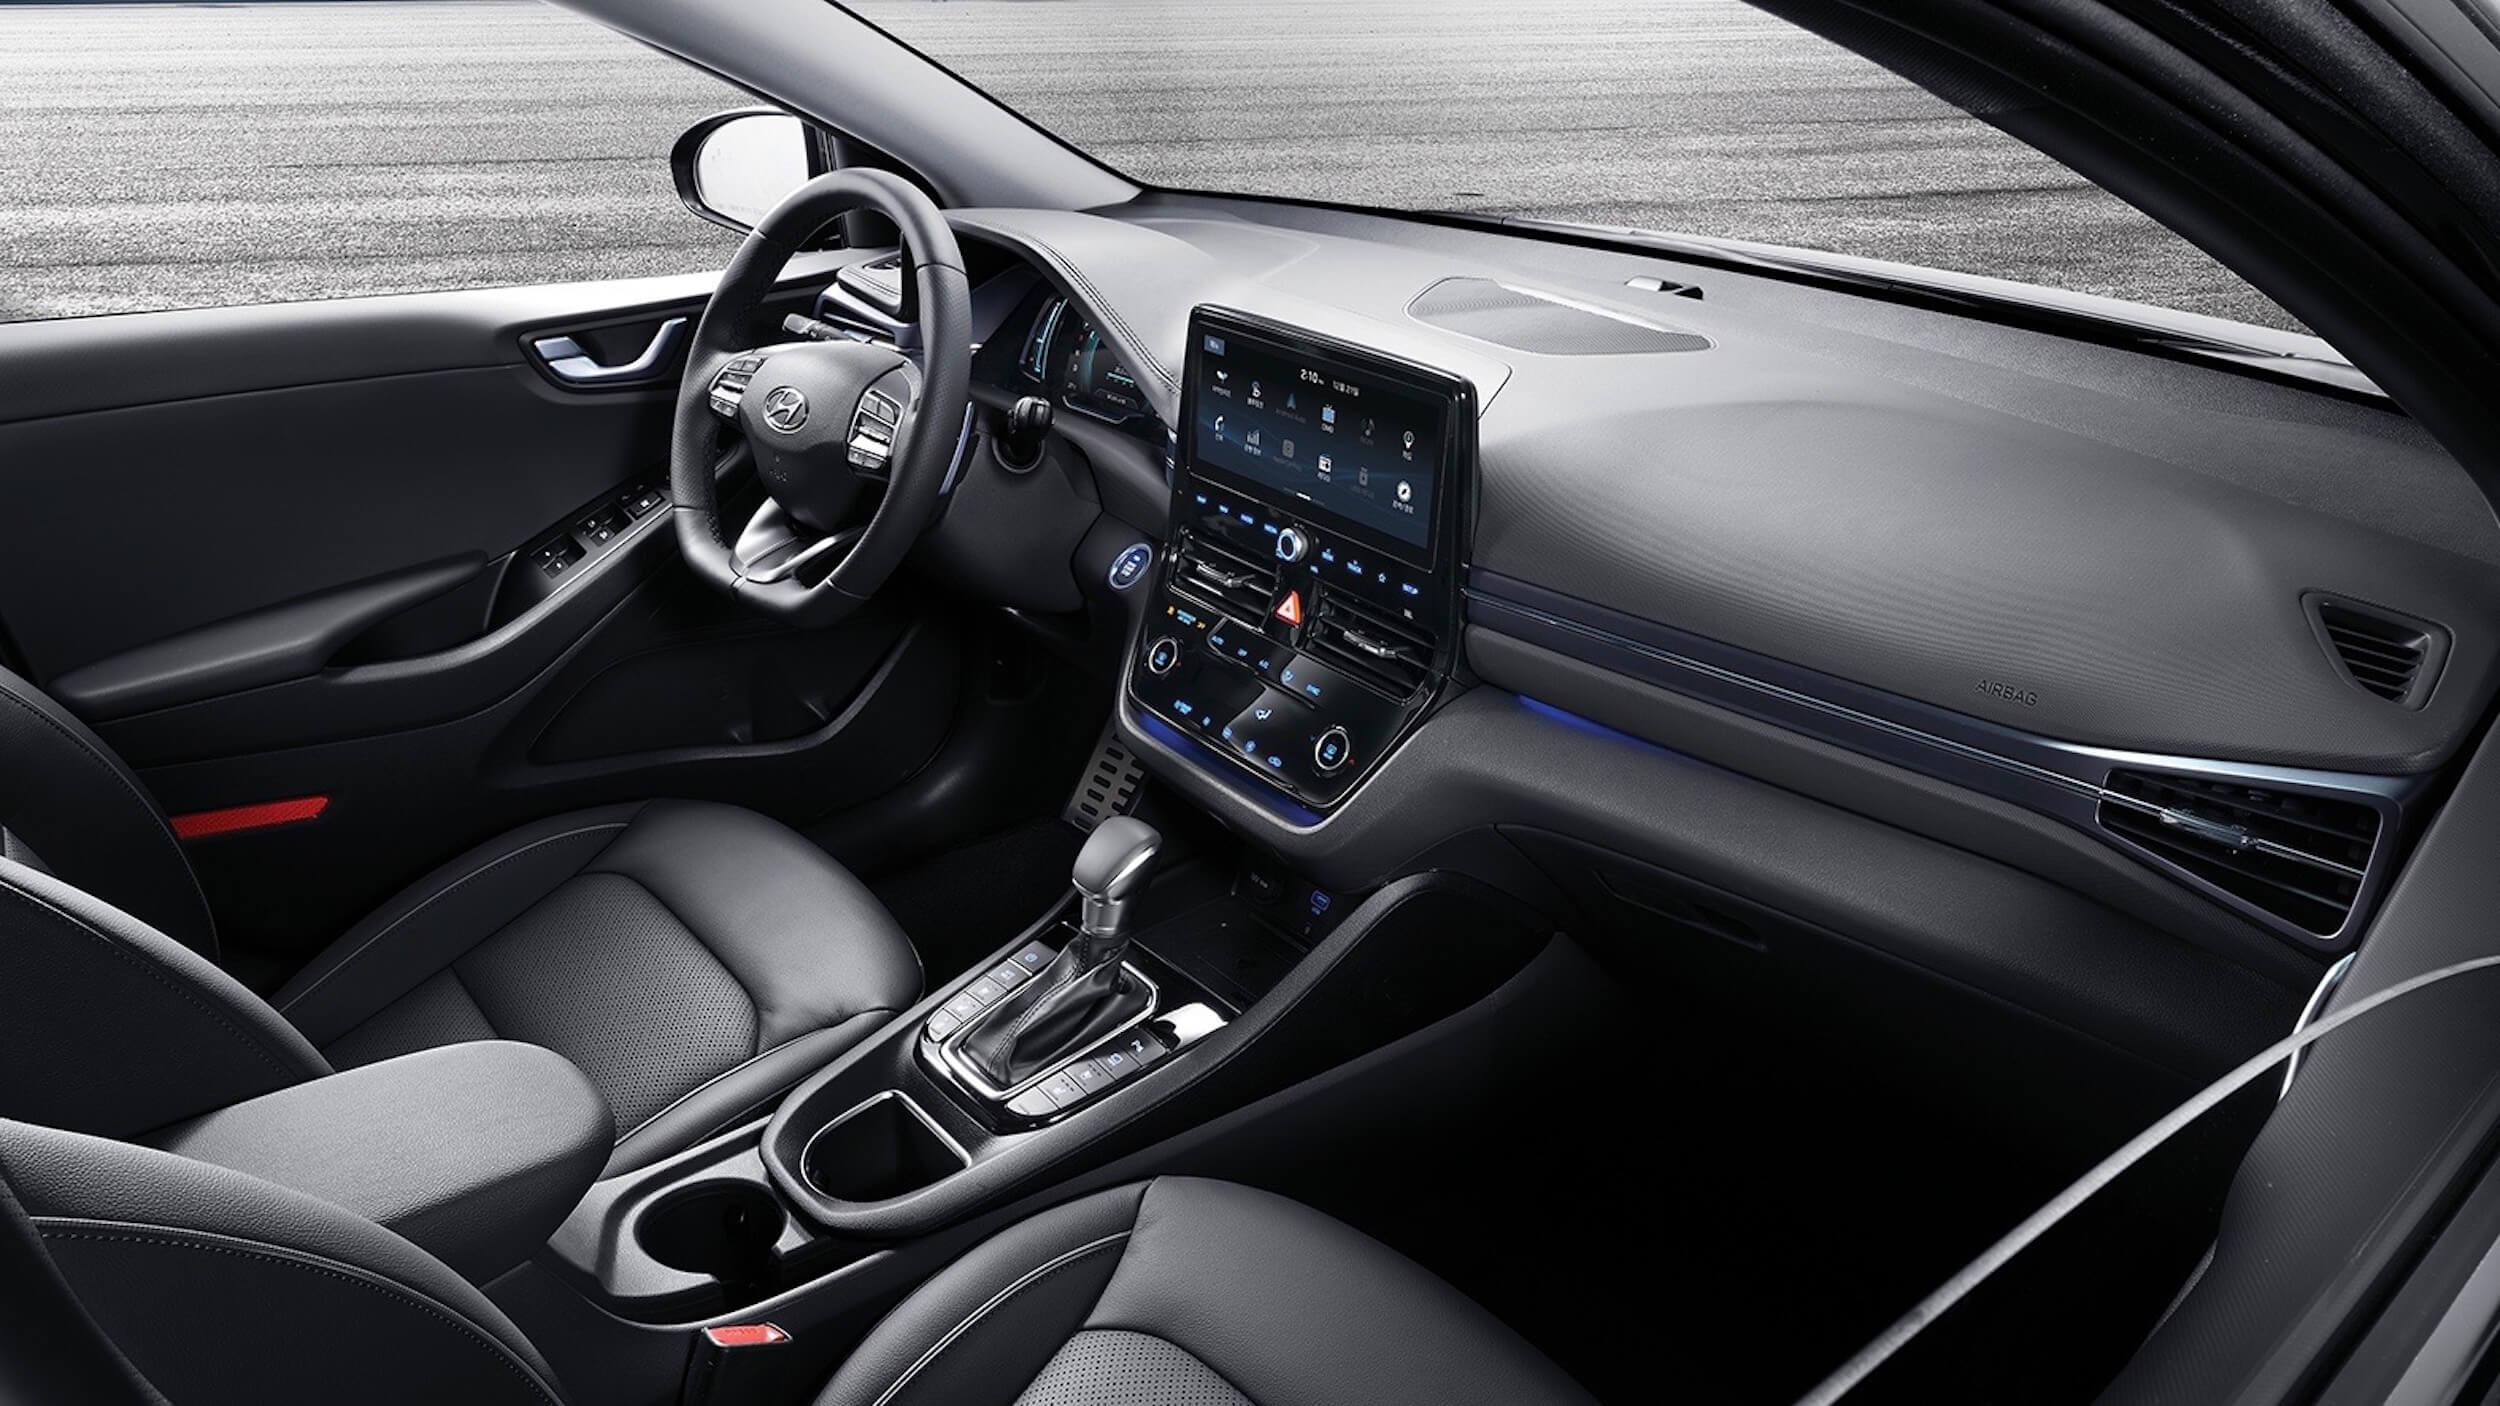 2019 Nieuwe Hyundai Ioniq Interieur